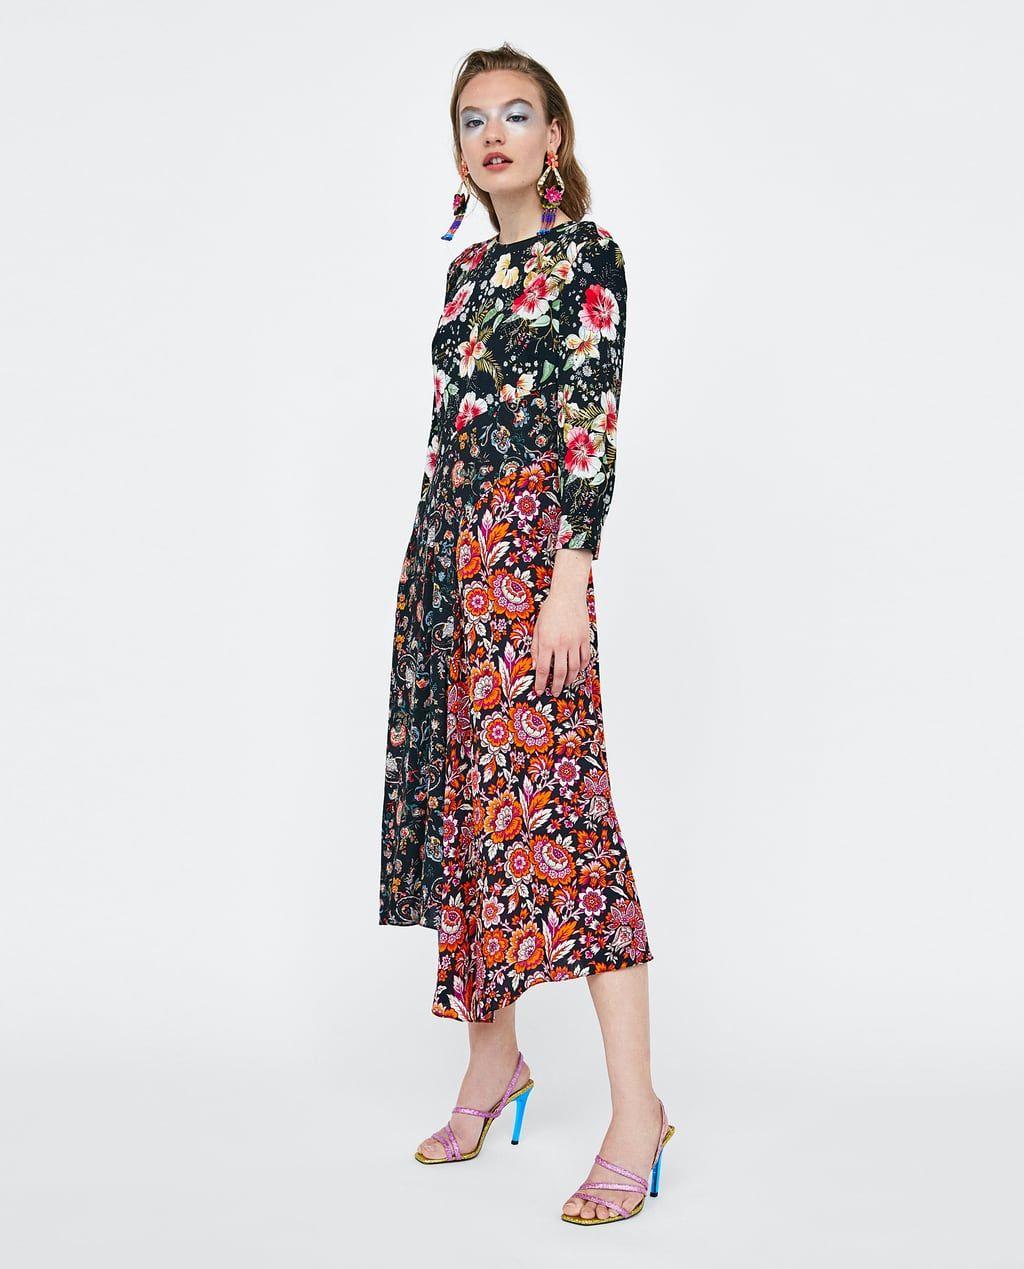 Image 1 Of Patchwork Print Dress From Zara Best Wedding Guest Dresses Modest Summer Dresses Dresses [ 1269 x 1024 Pixel ]